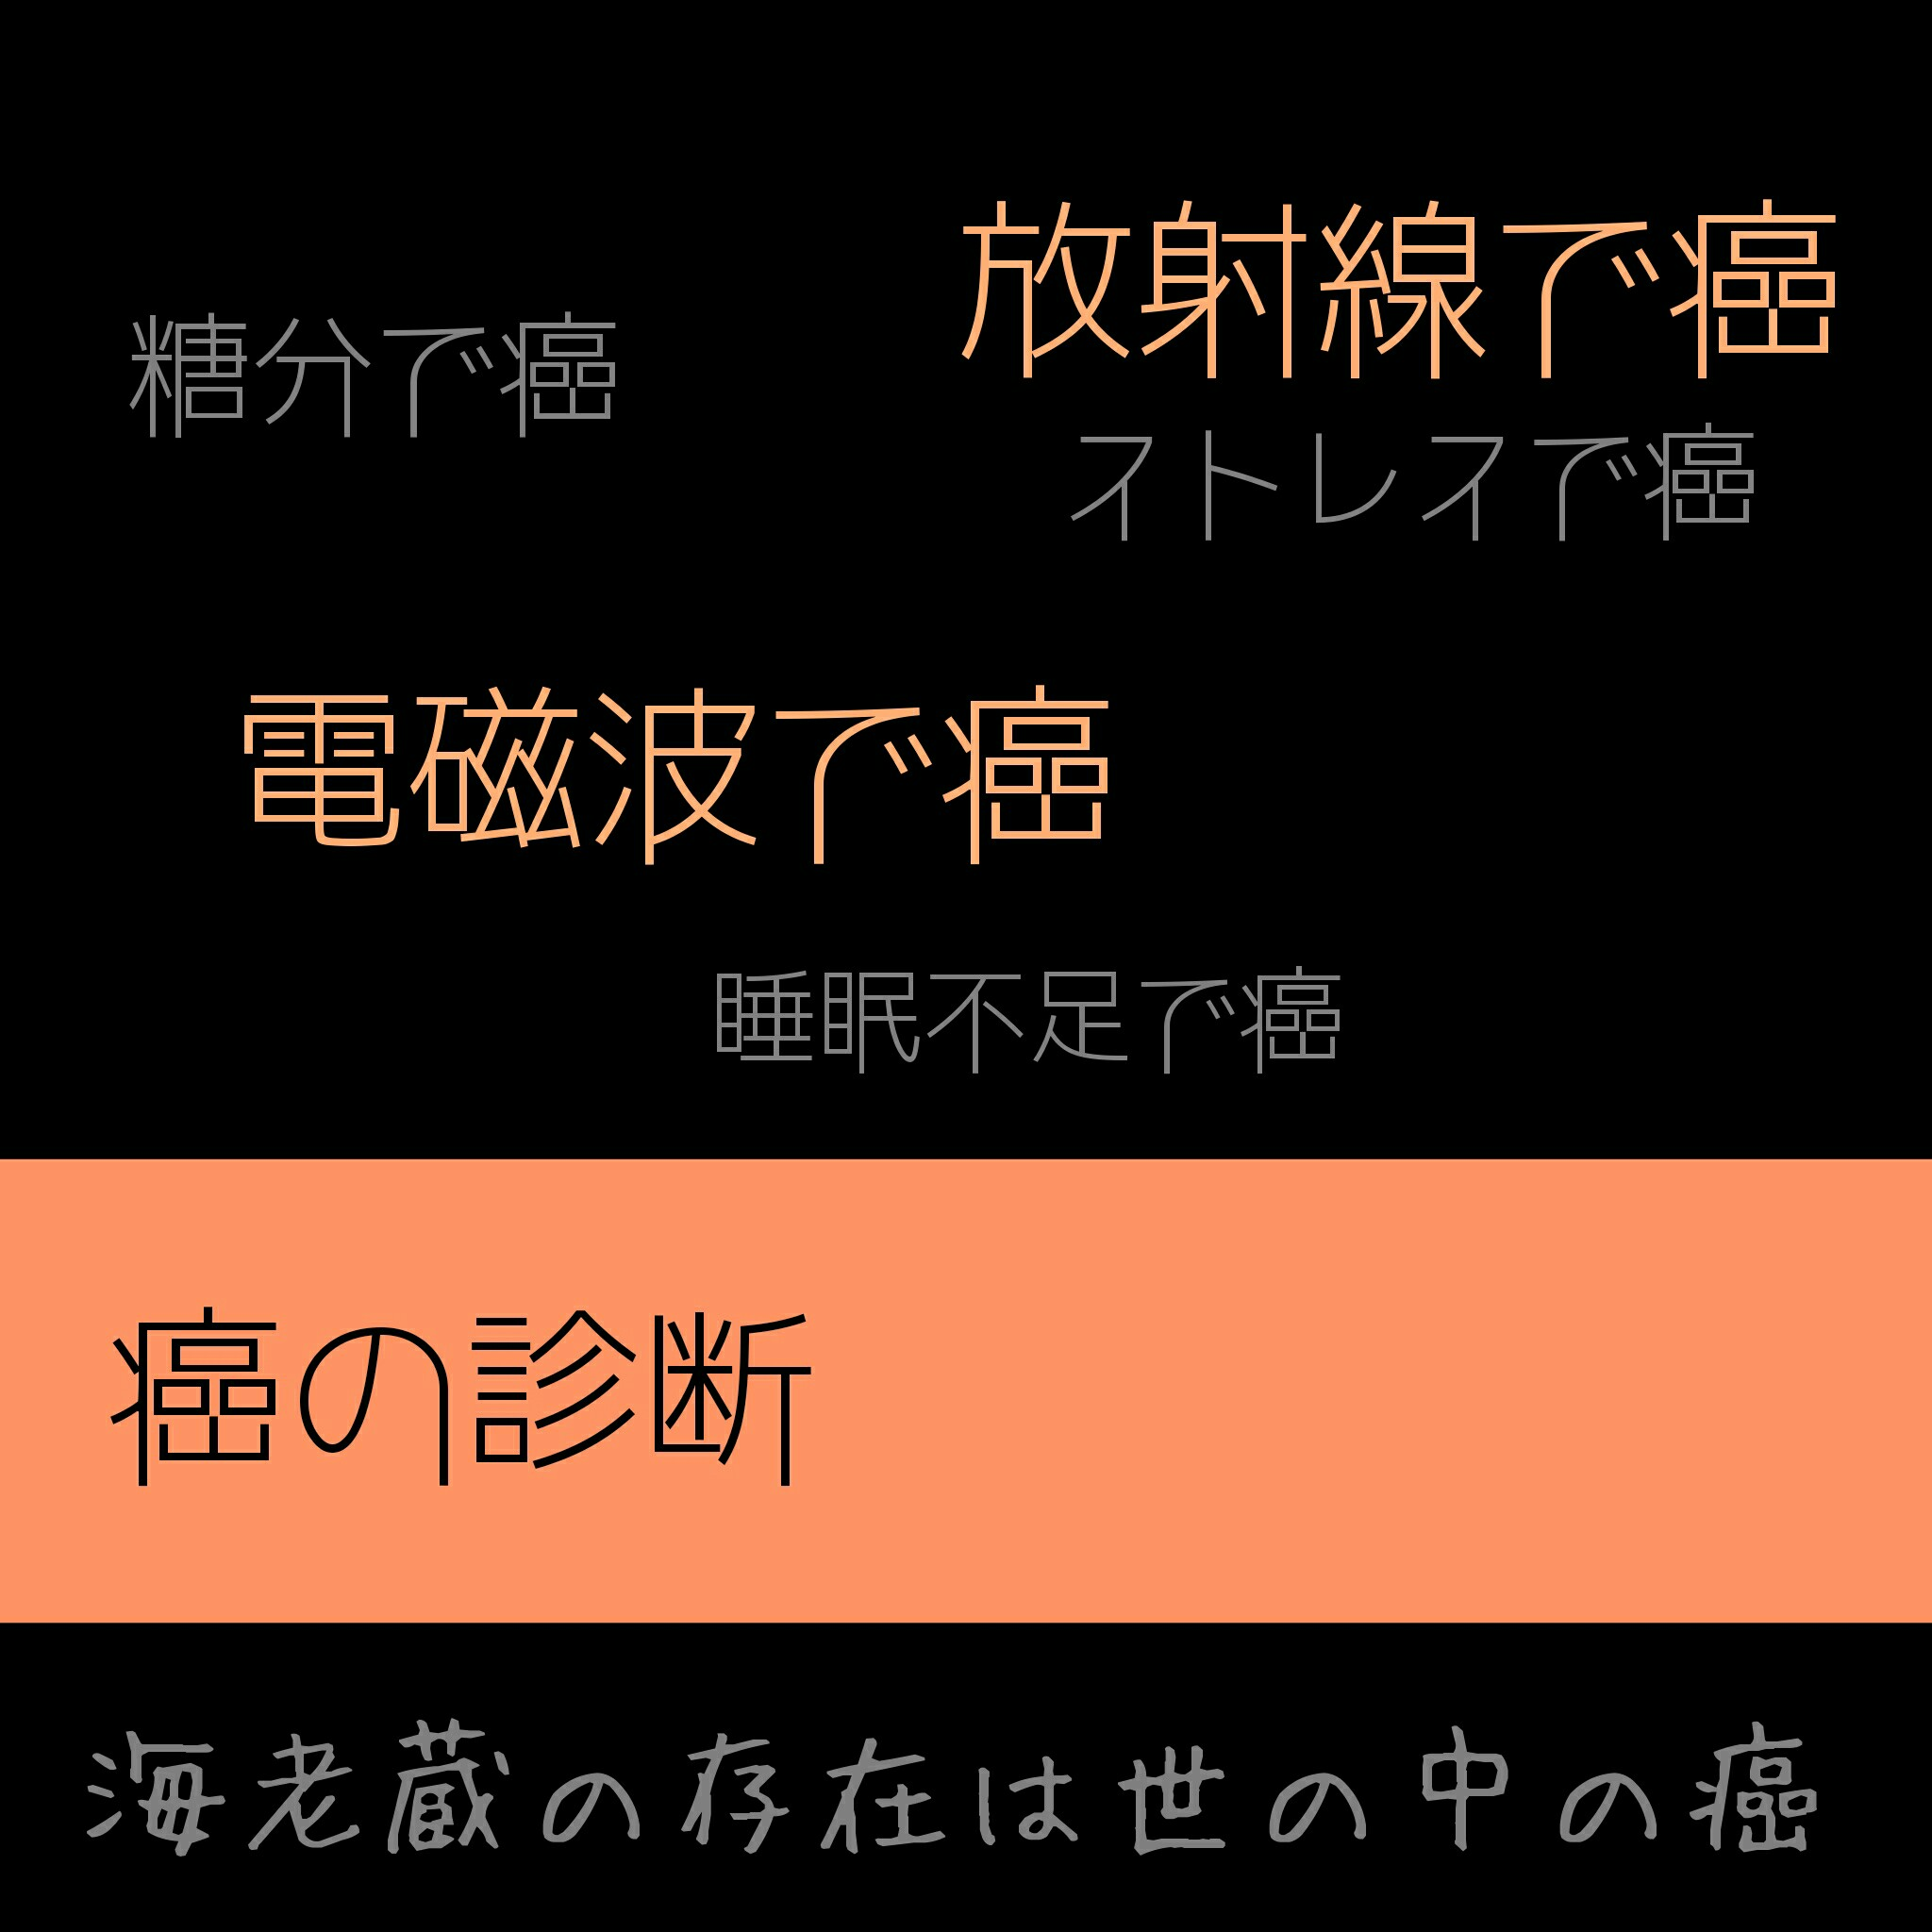 f:id:Sano7:20170701192928j:image